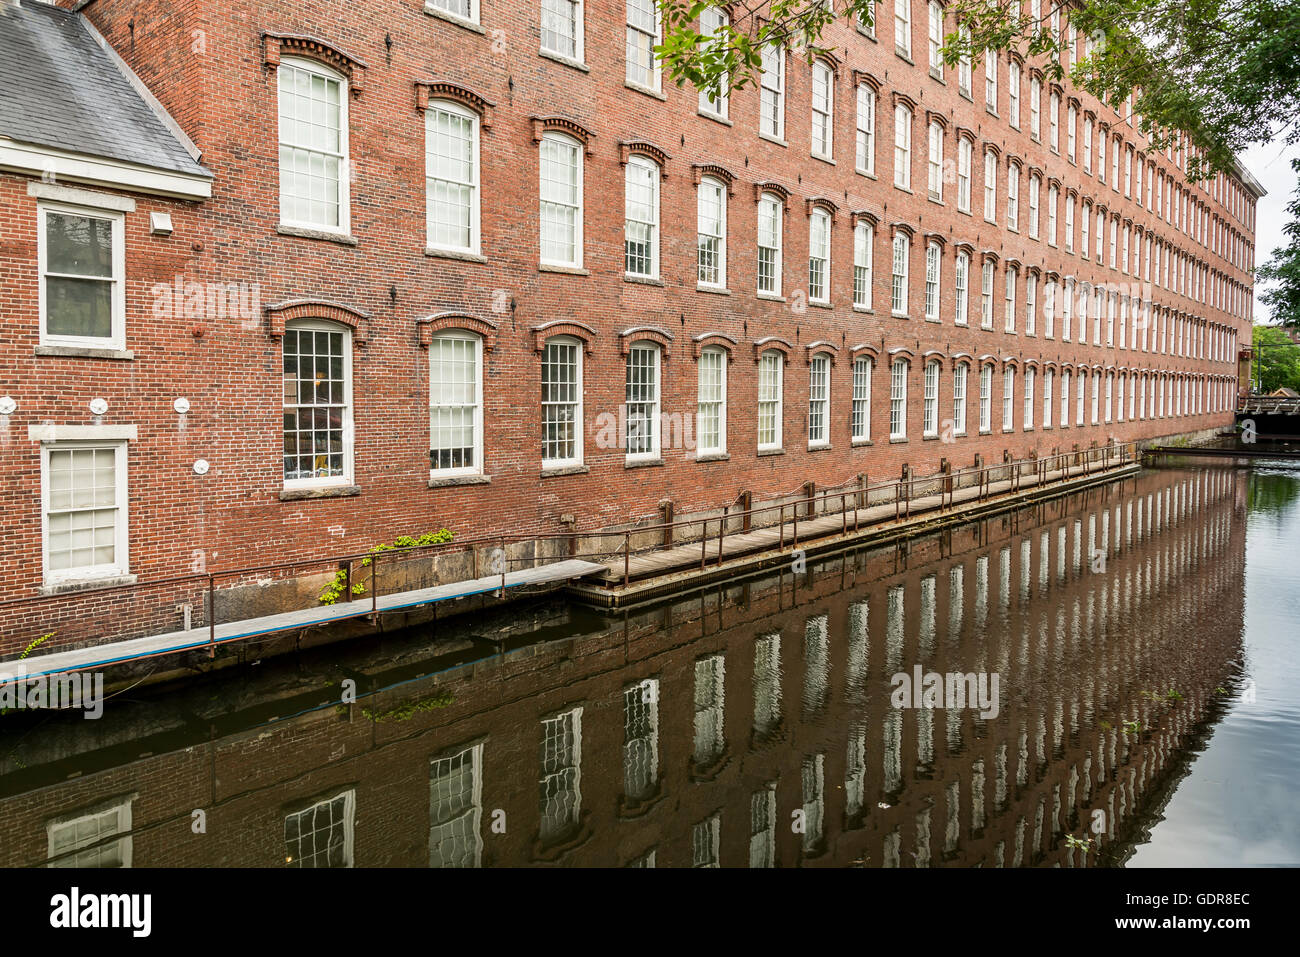 Boott Cotton Mills brick - Stock Image